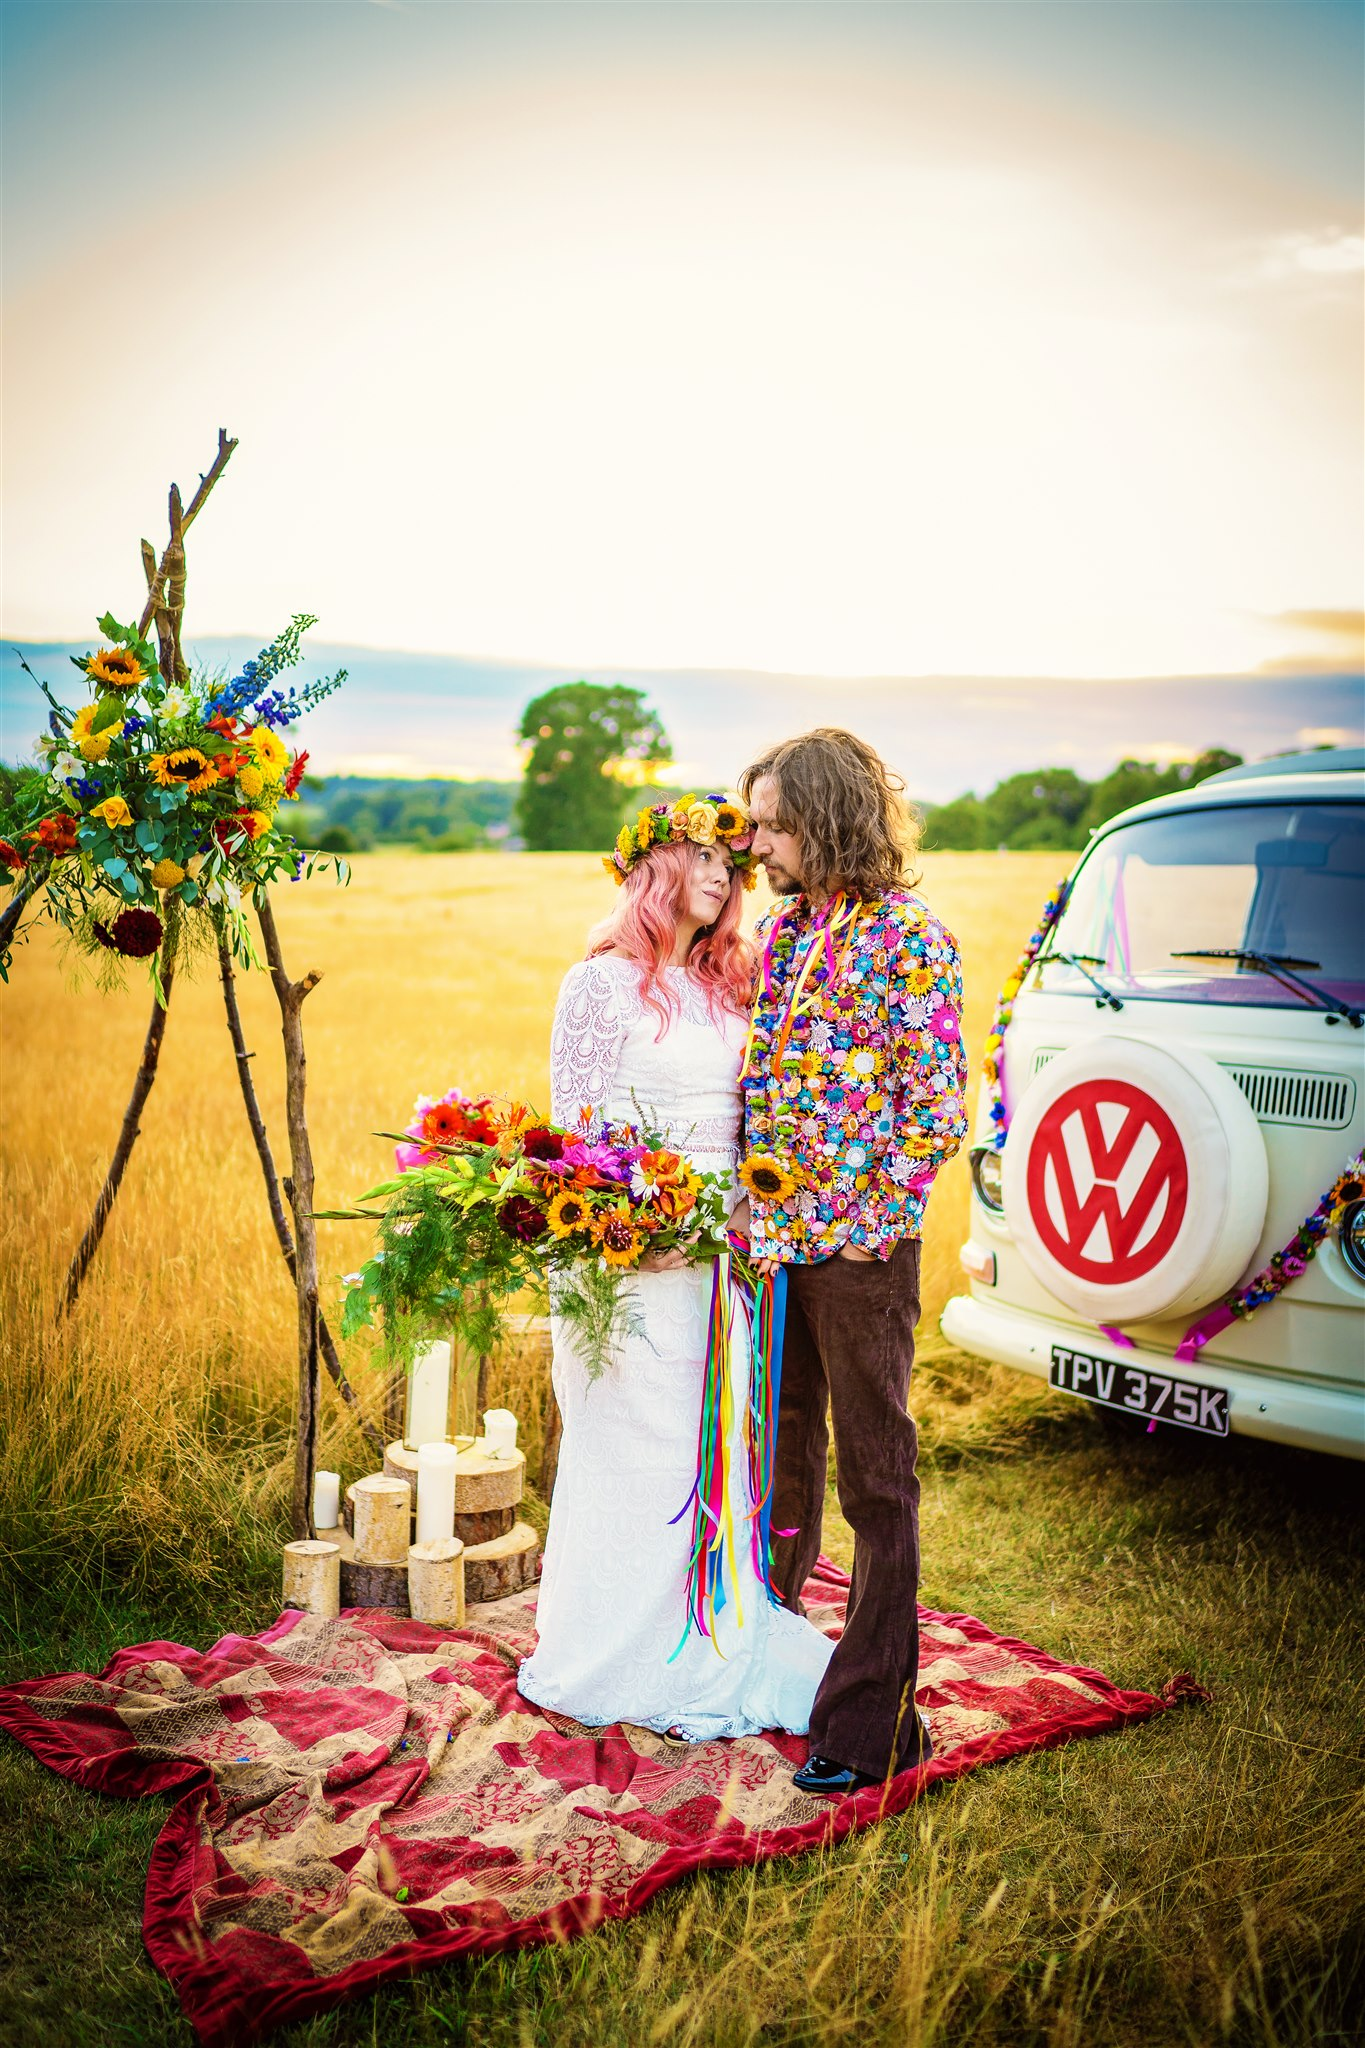 colourful bohemian wedding - 70s wedding - campervan wedding - hippie wedding - alternative wedding inspiration